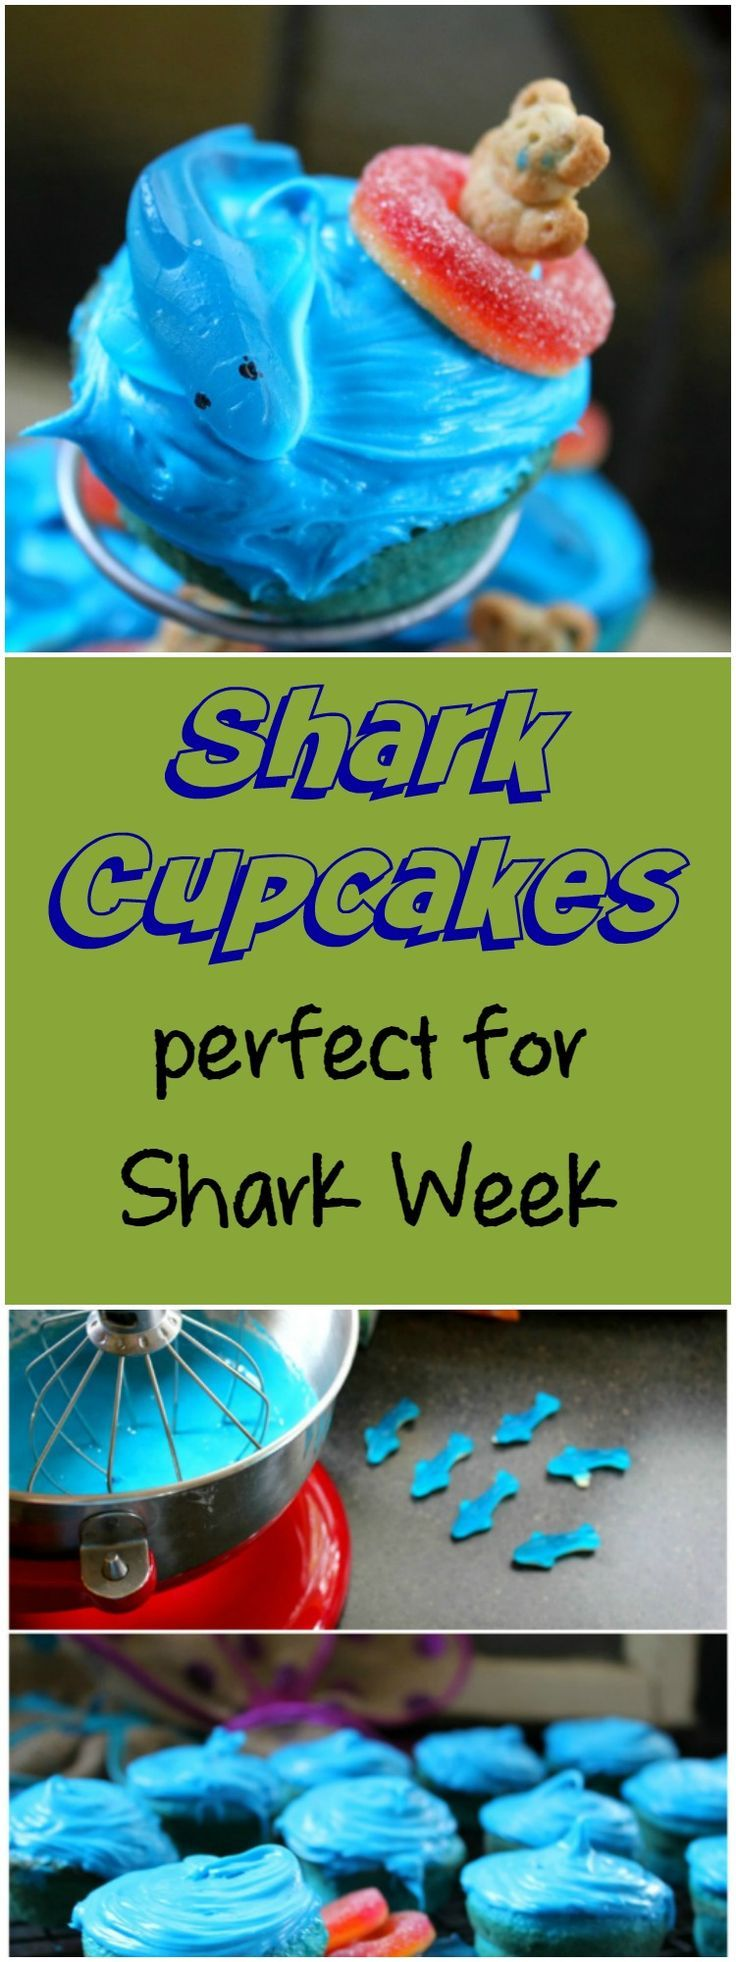 Shark Cupcakes Perfect for Shark Week